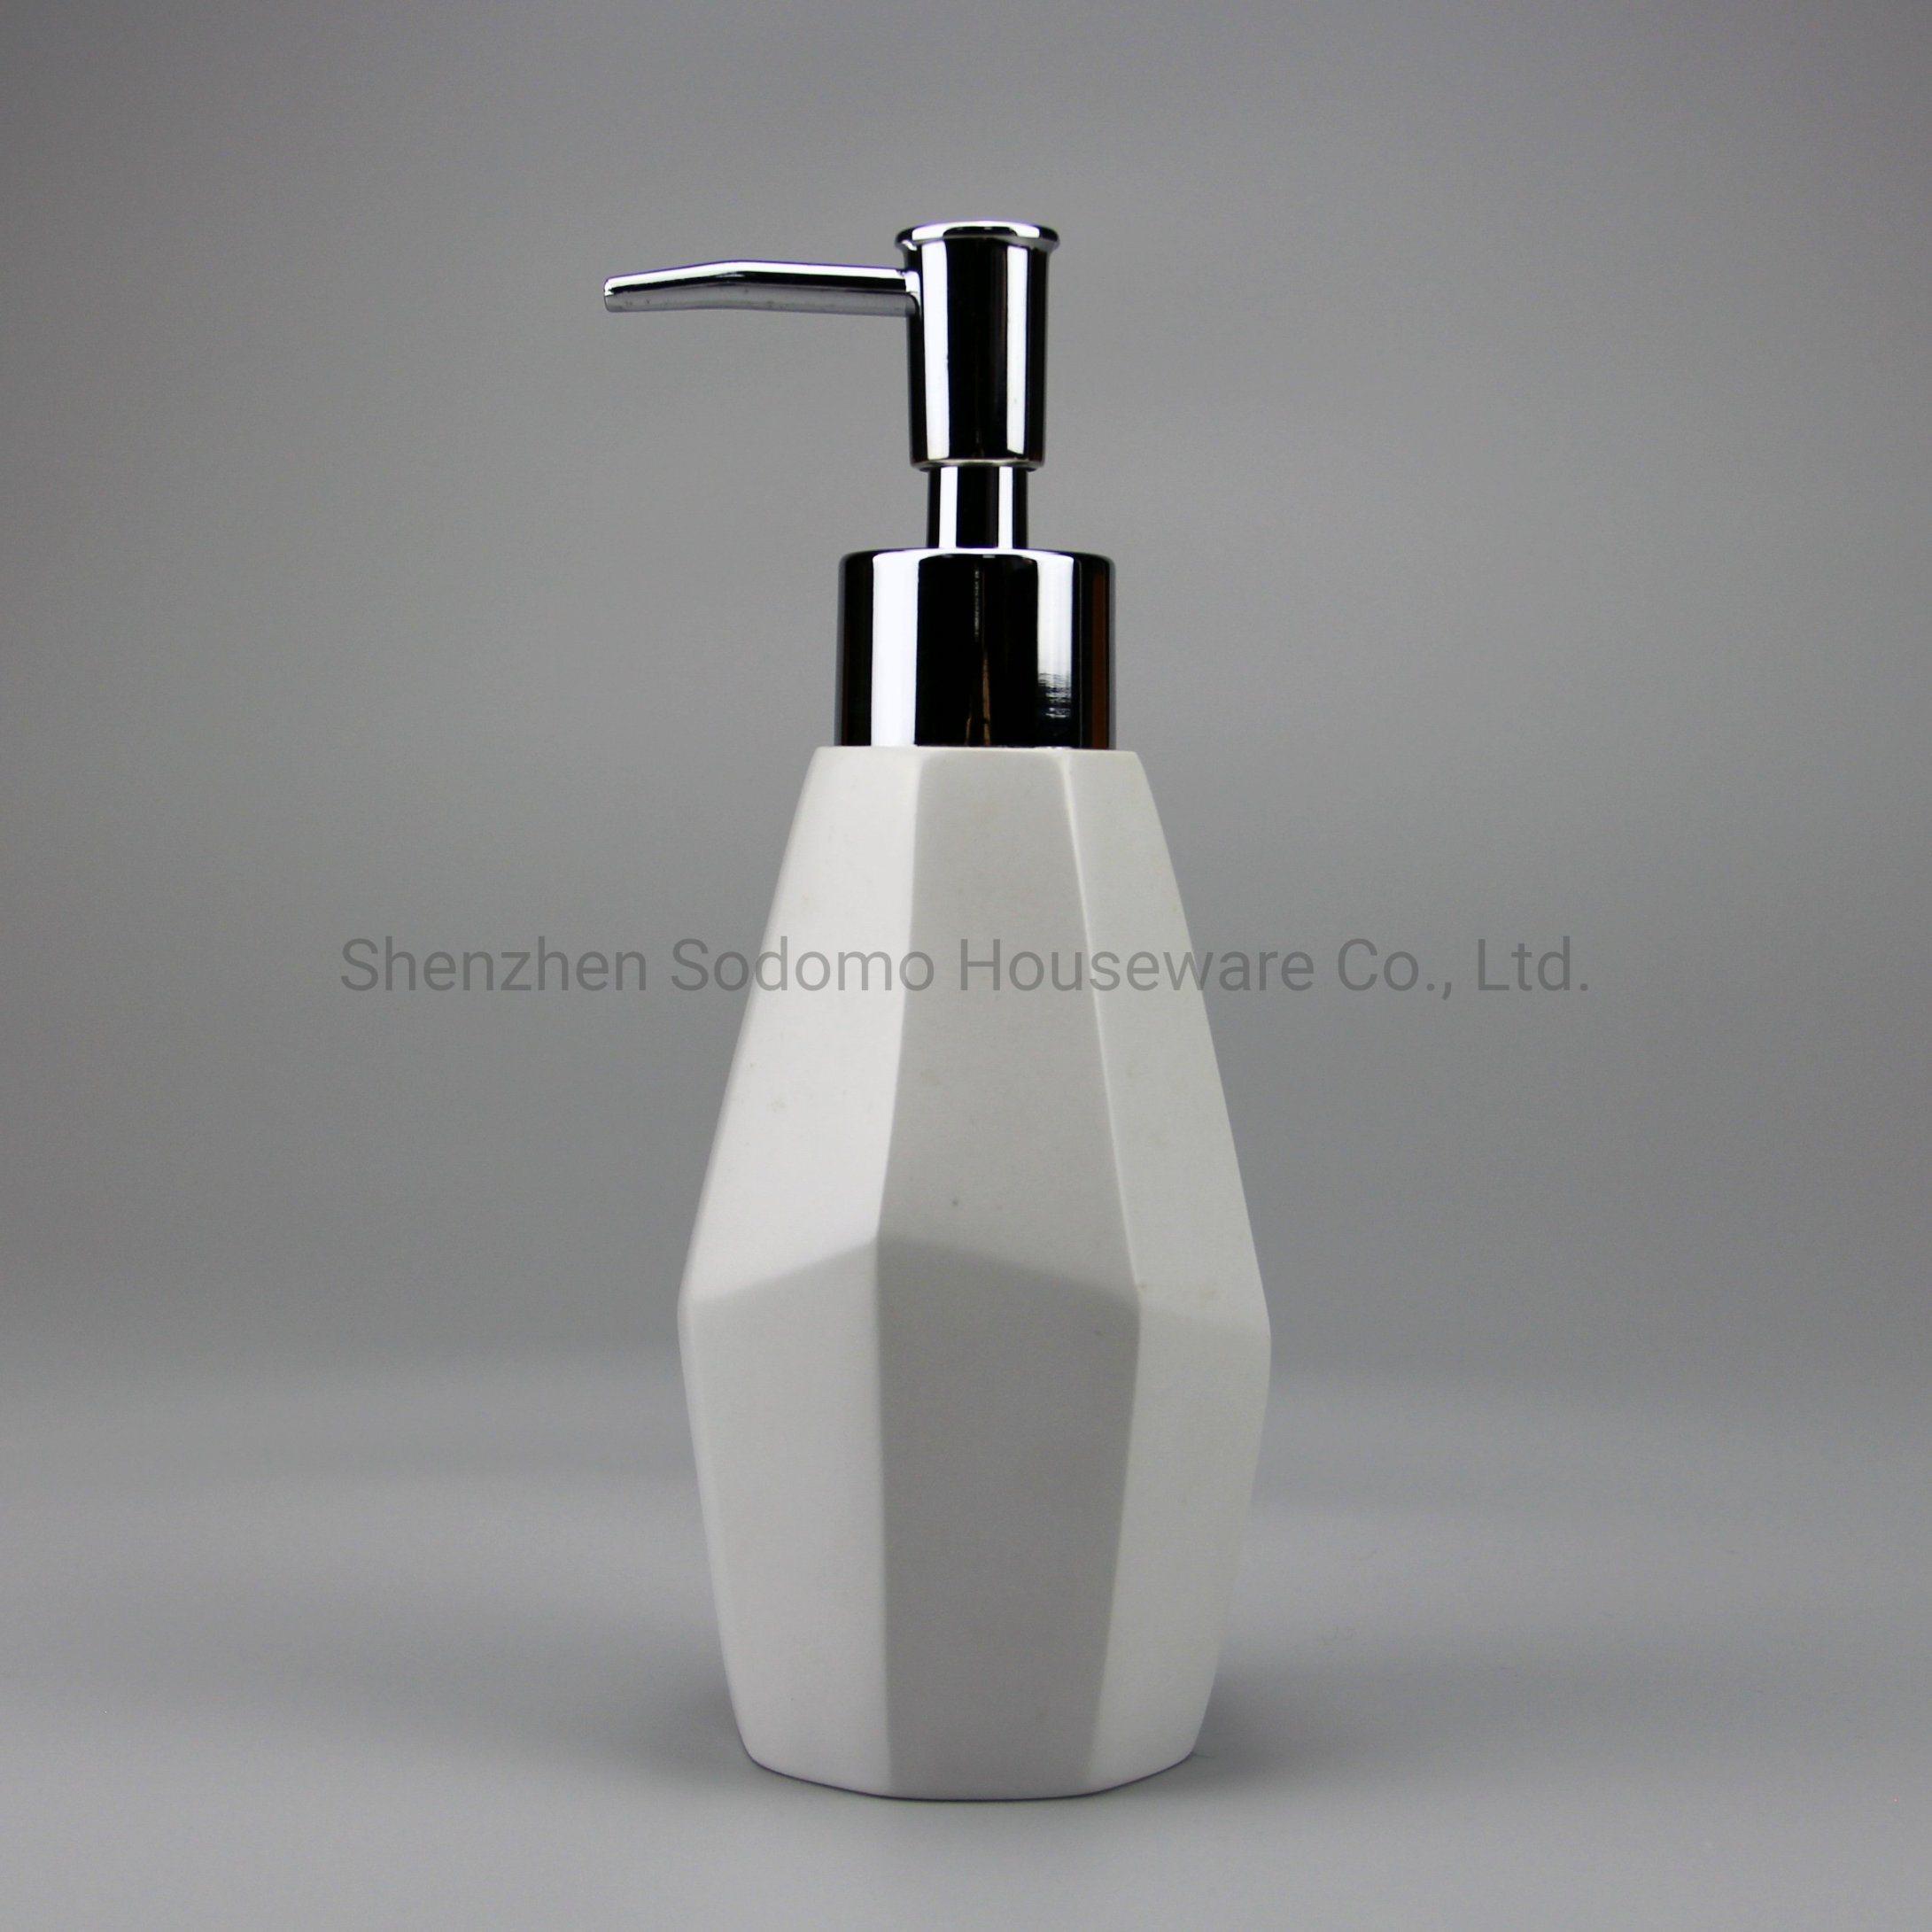 Top Selling Modern Houseware Imitated Stone Soap Dispenser Bp2451 Wp China Bathroom Set Bathroom Accessory Made In China Com